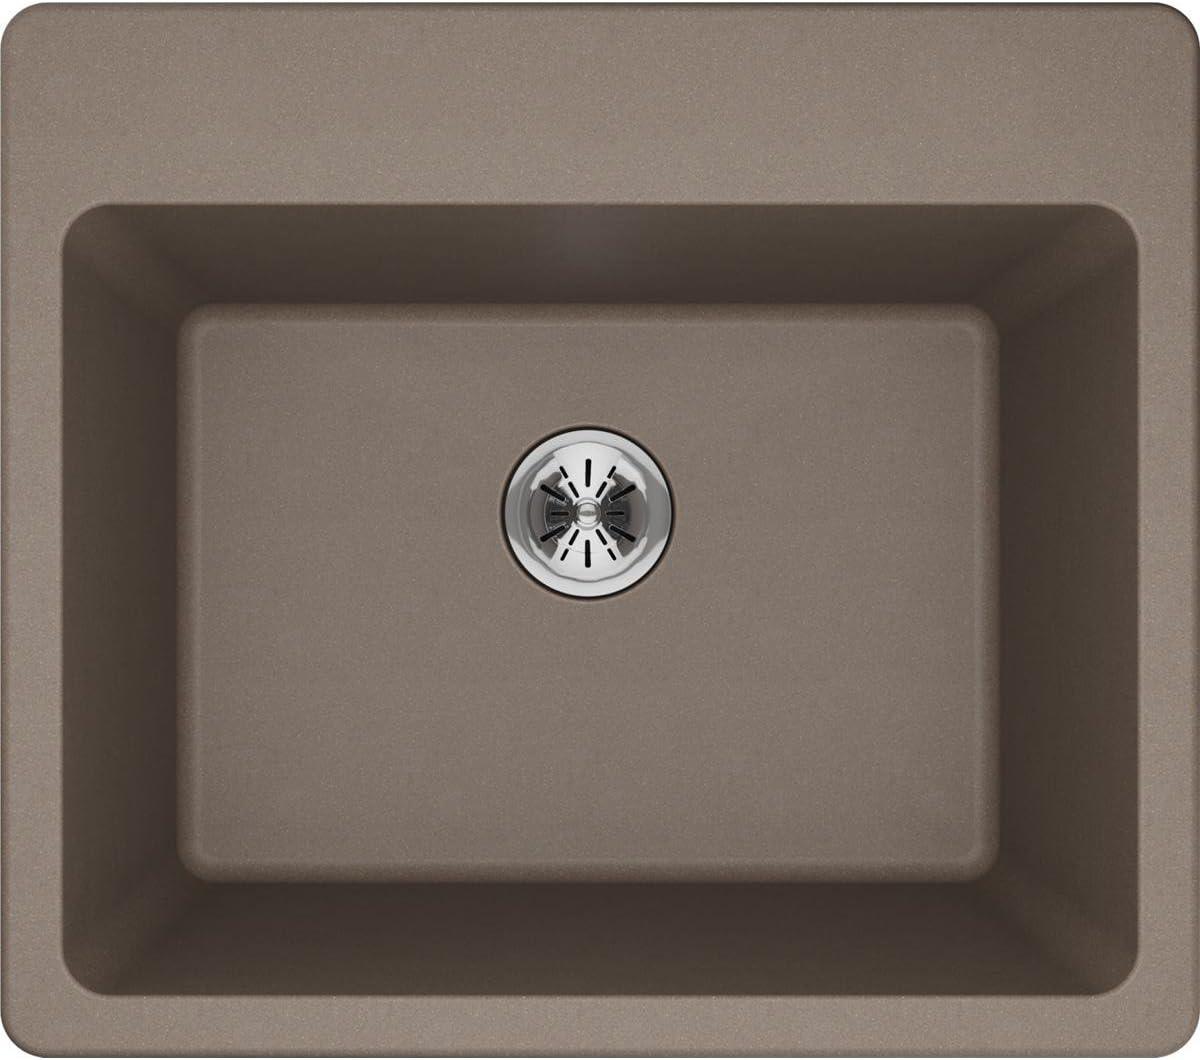 Elkay Quartz Classic ELG252212PDGR0 Greige Single Bowl Top Mount Laundry Sink with Perfect Drain